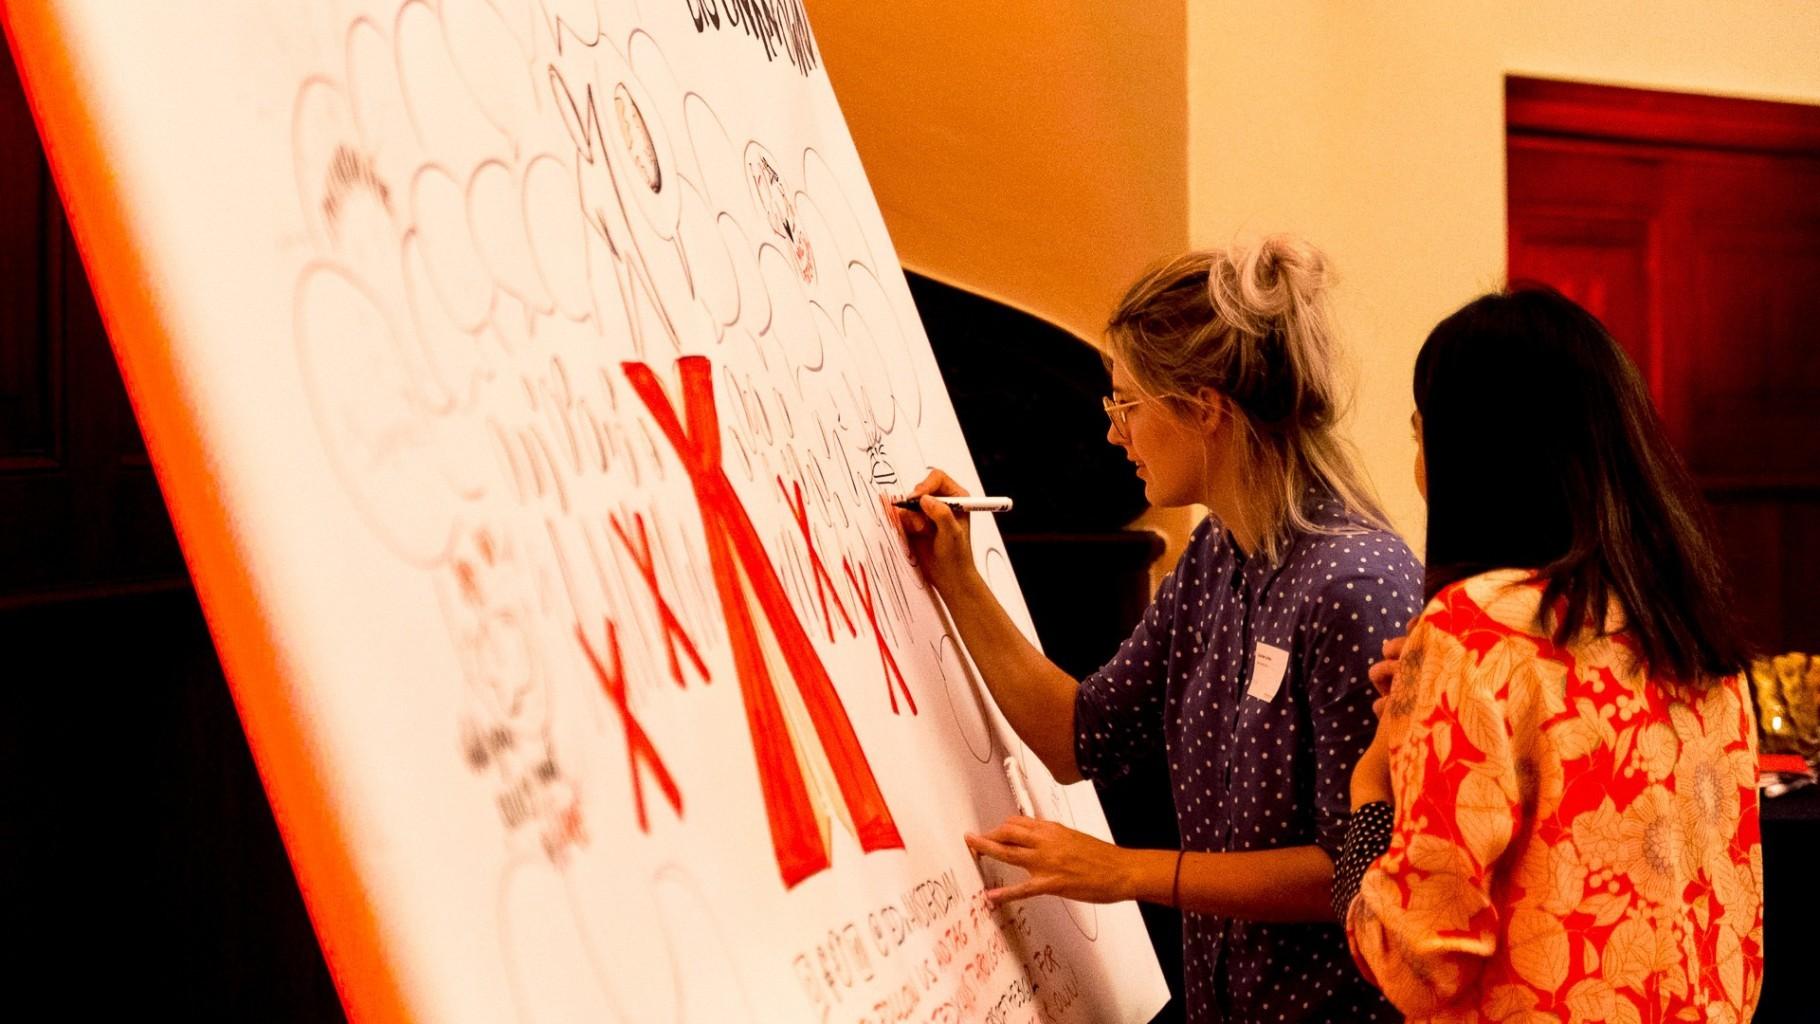 Visual notes event visualizing TEDx illustrator